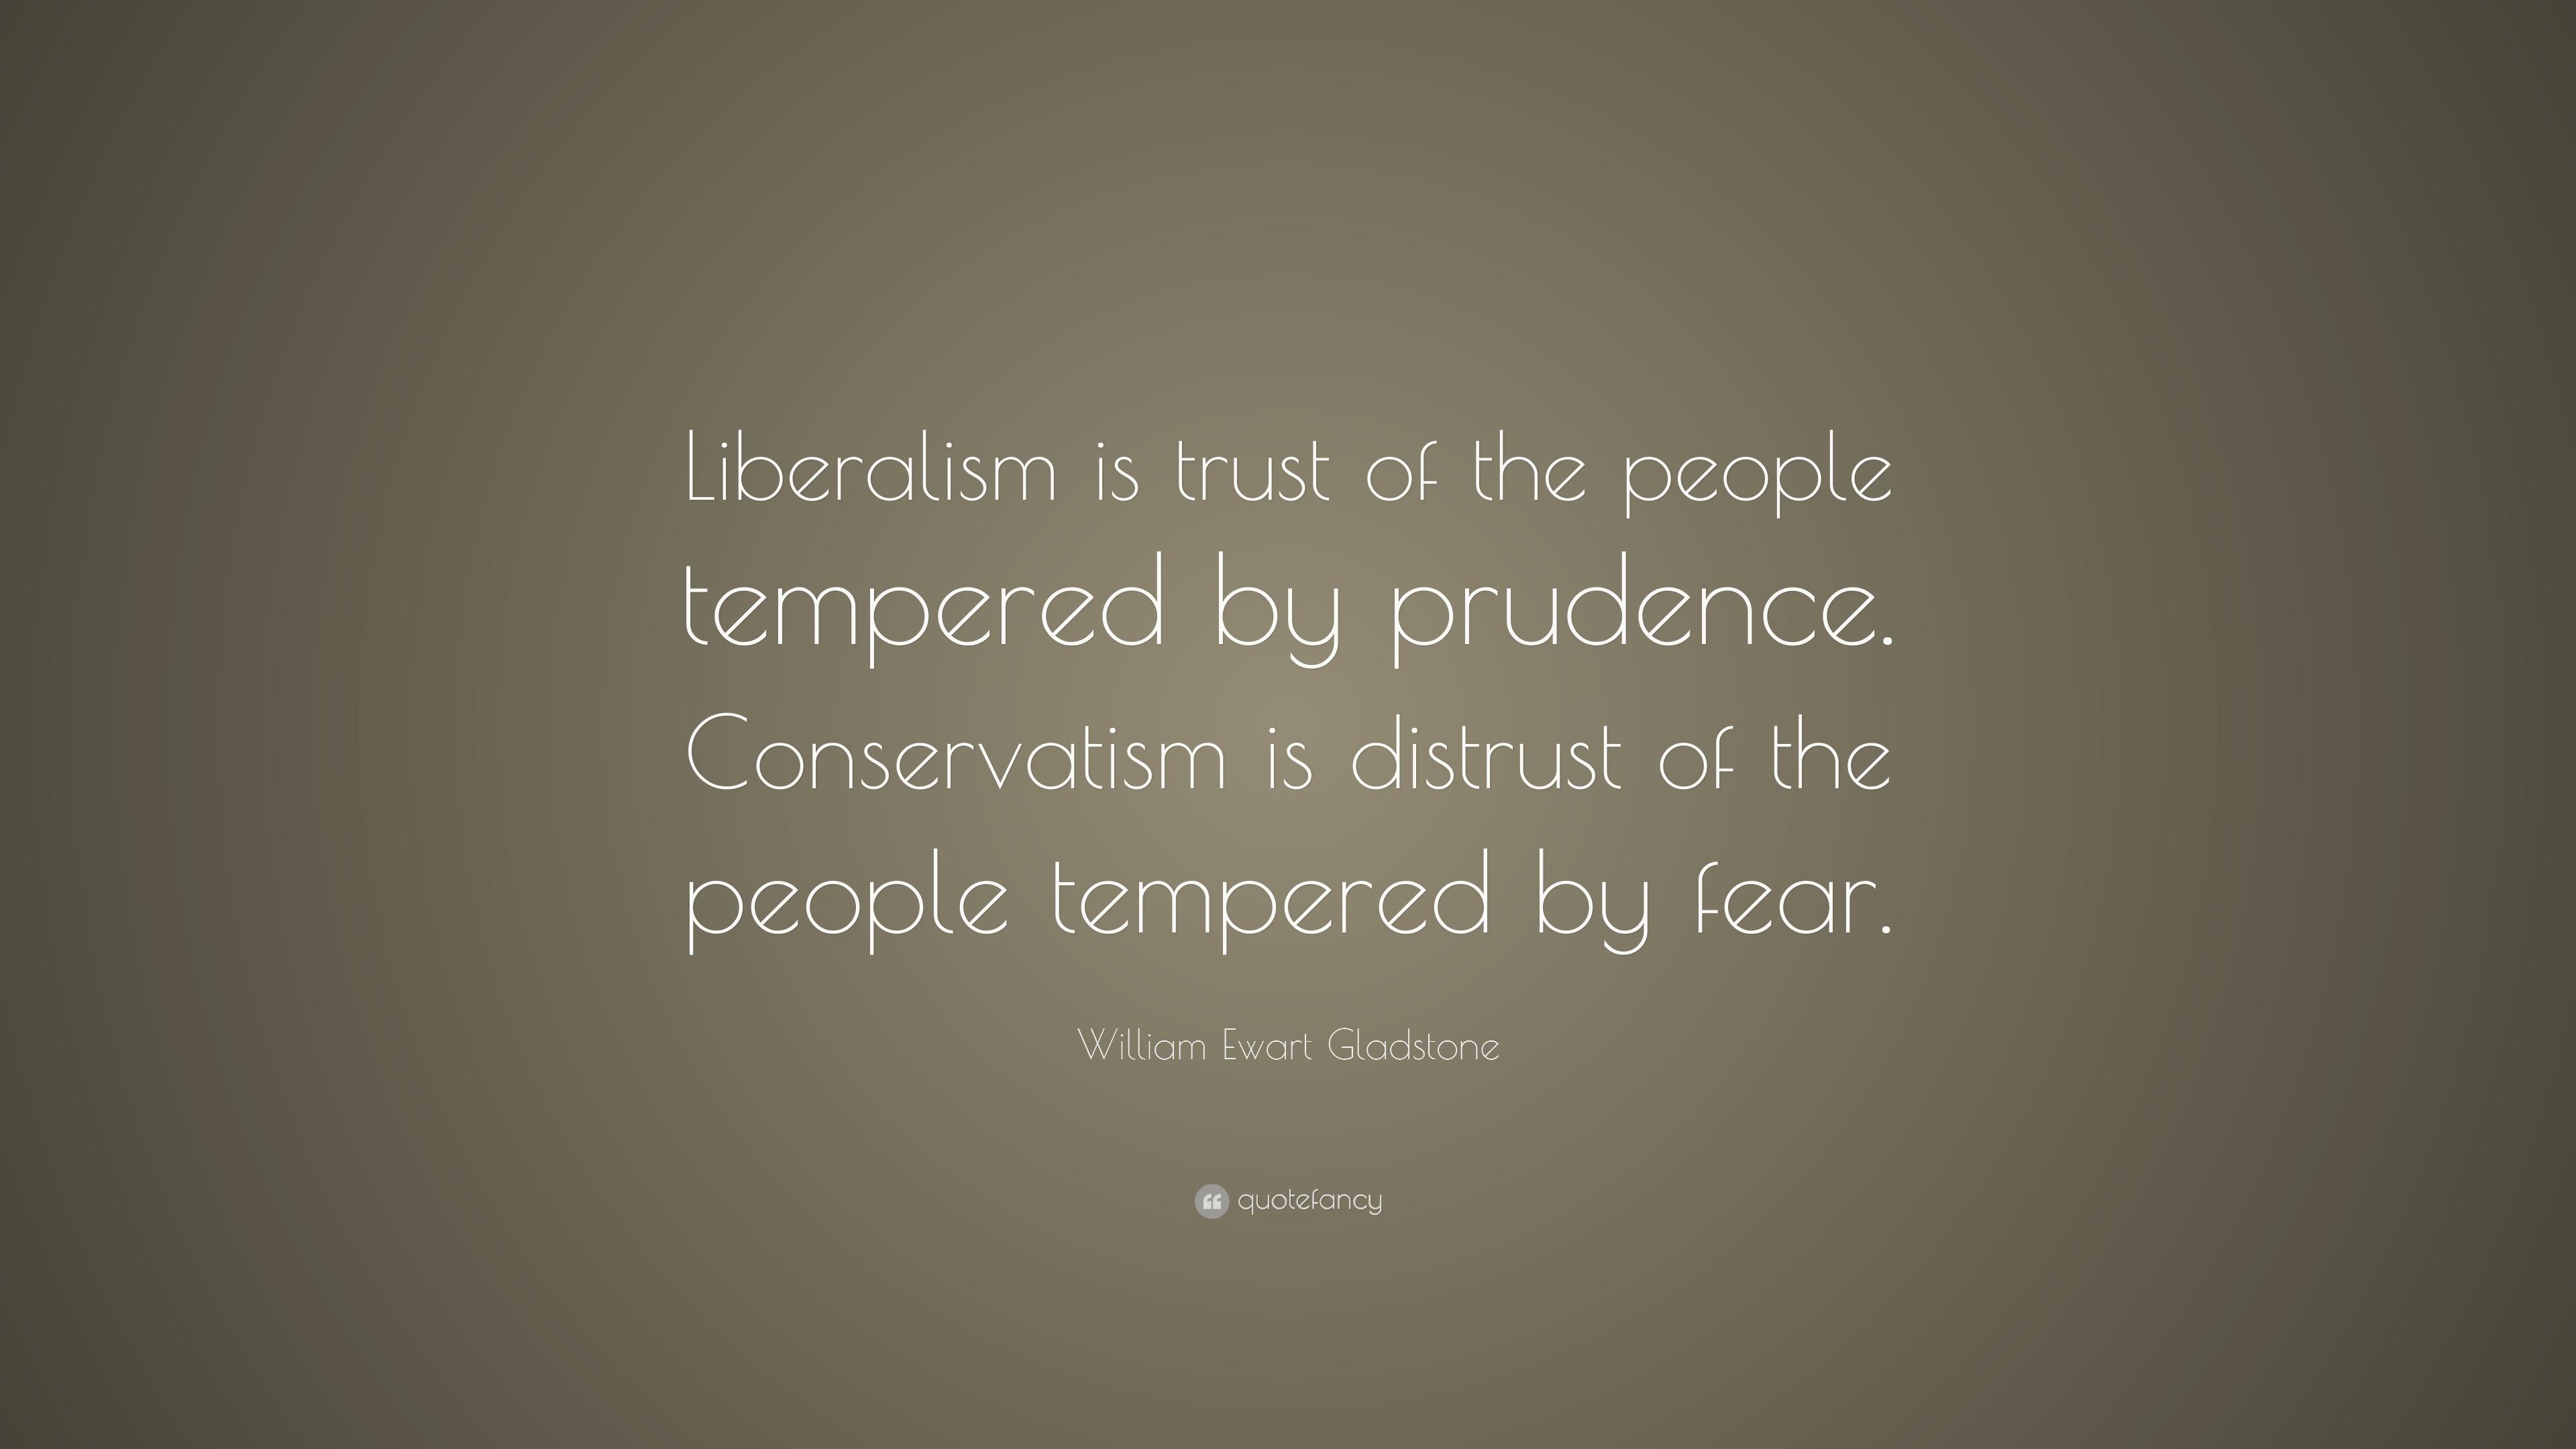 William ewart gladstone quote liberalism is trust of the people william ewart gladstone quote liberalism is trust of the people tempered by prudence sciox Choice Image